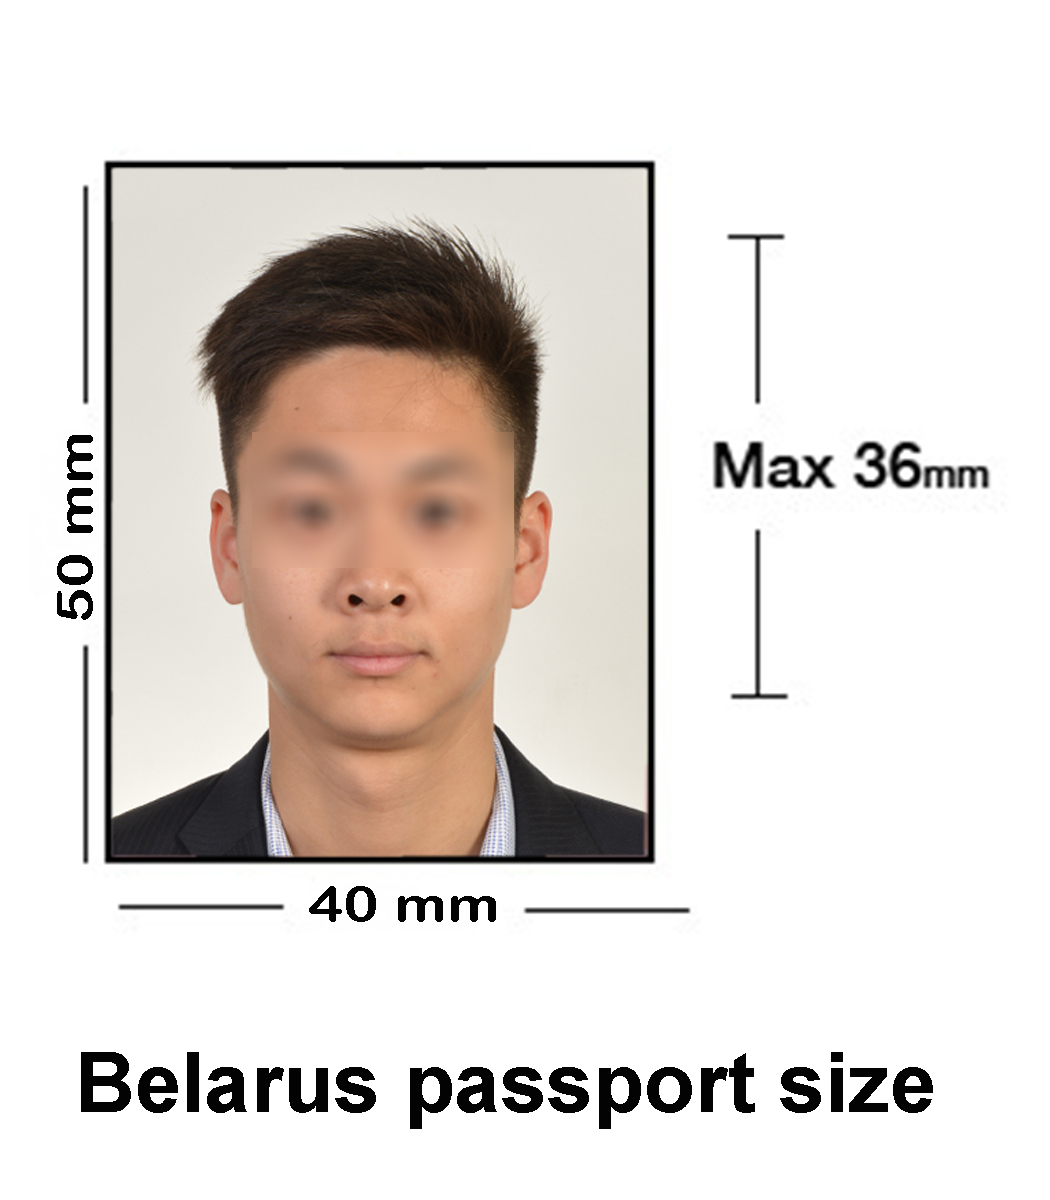 belarus-passport-size-01